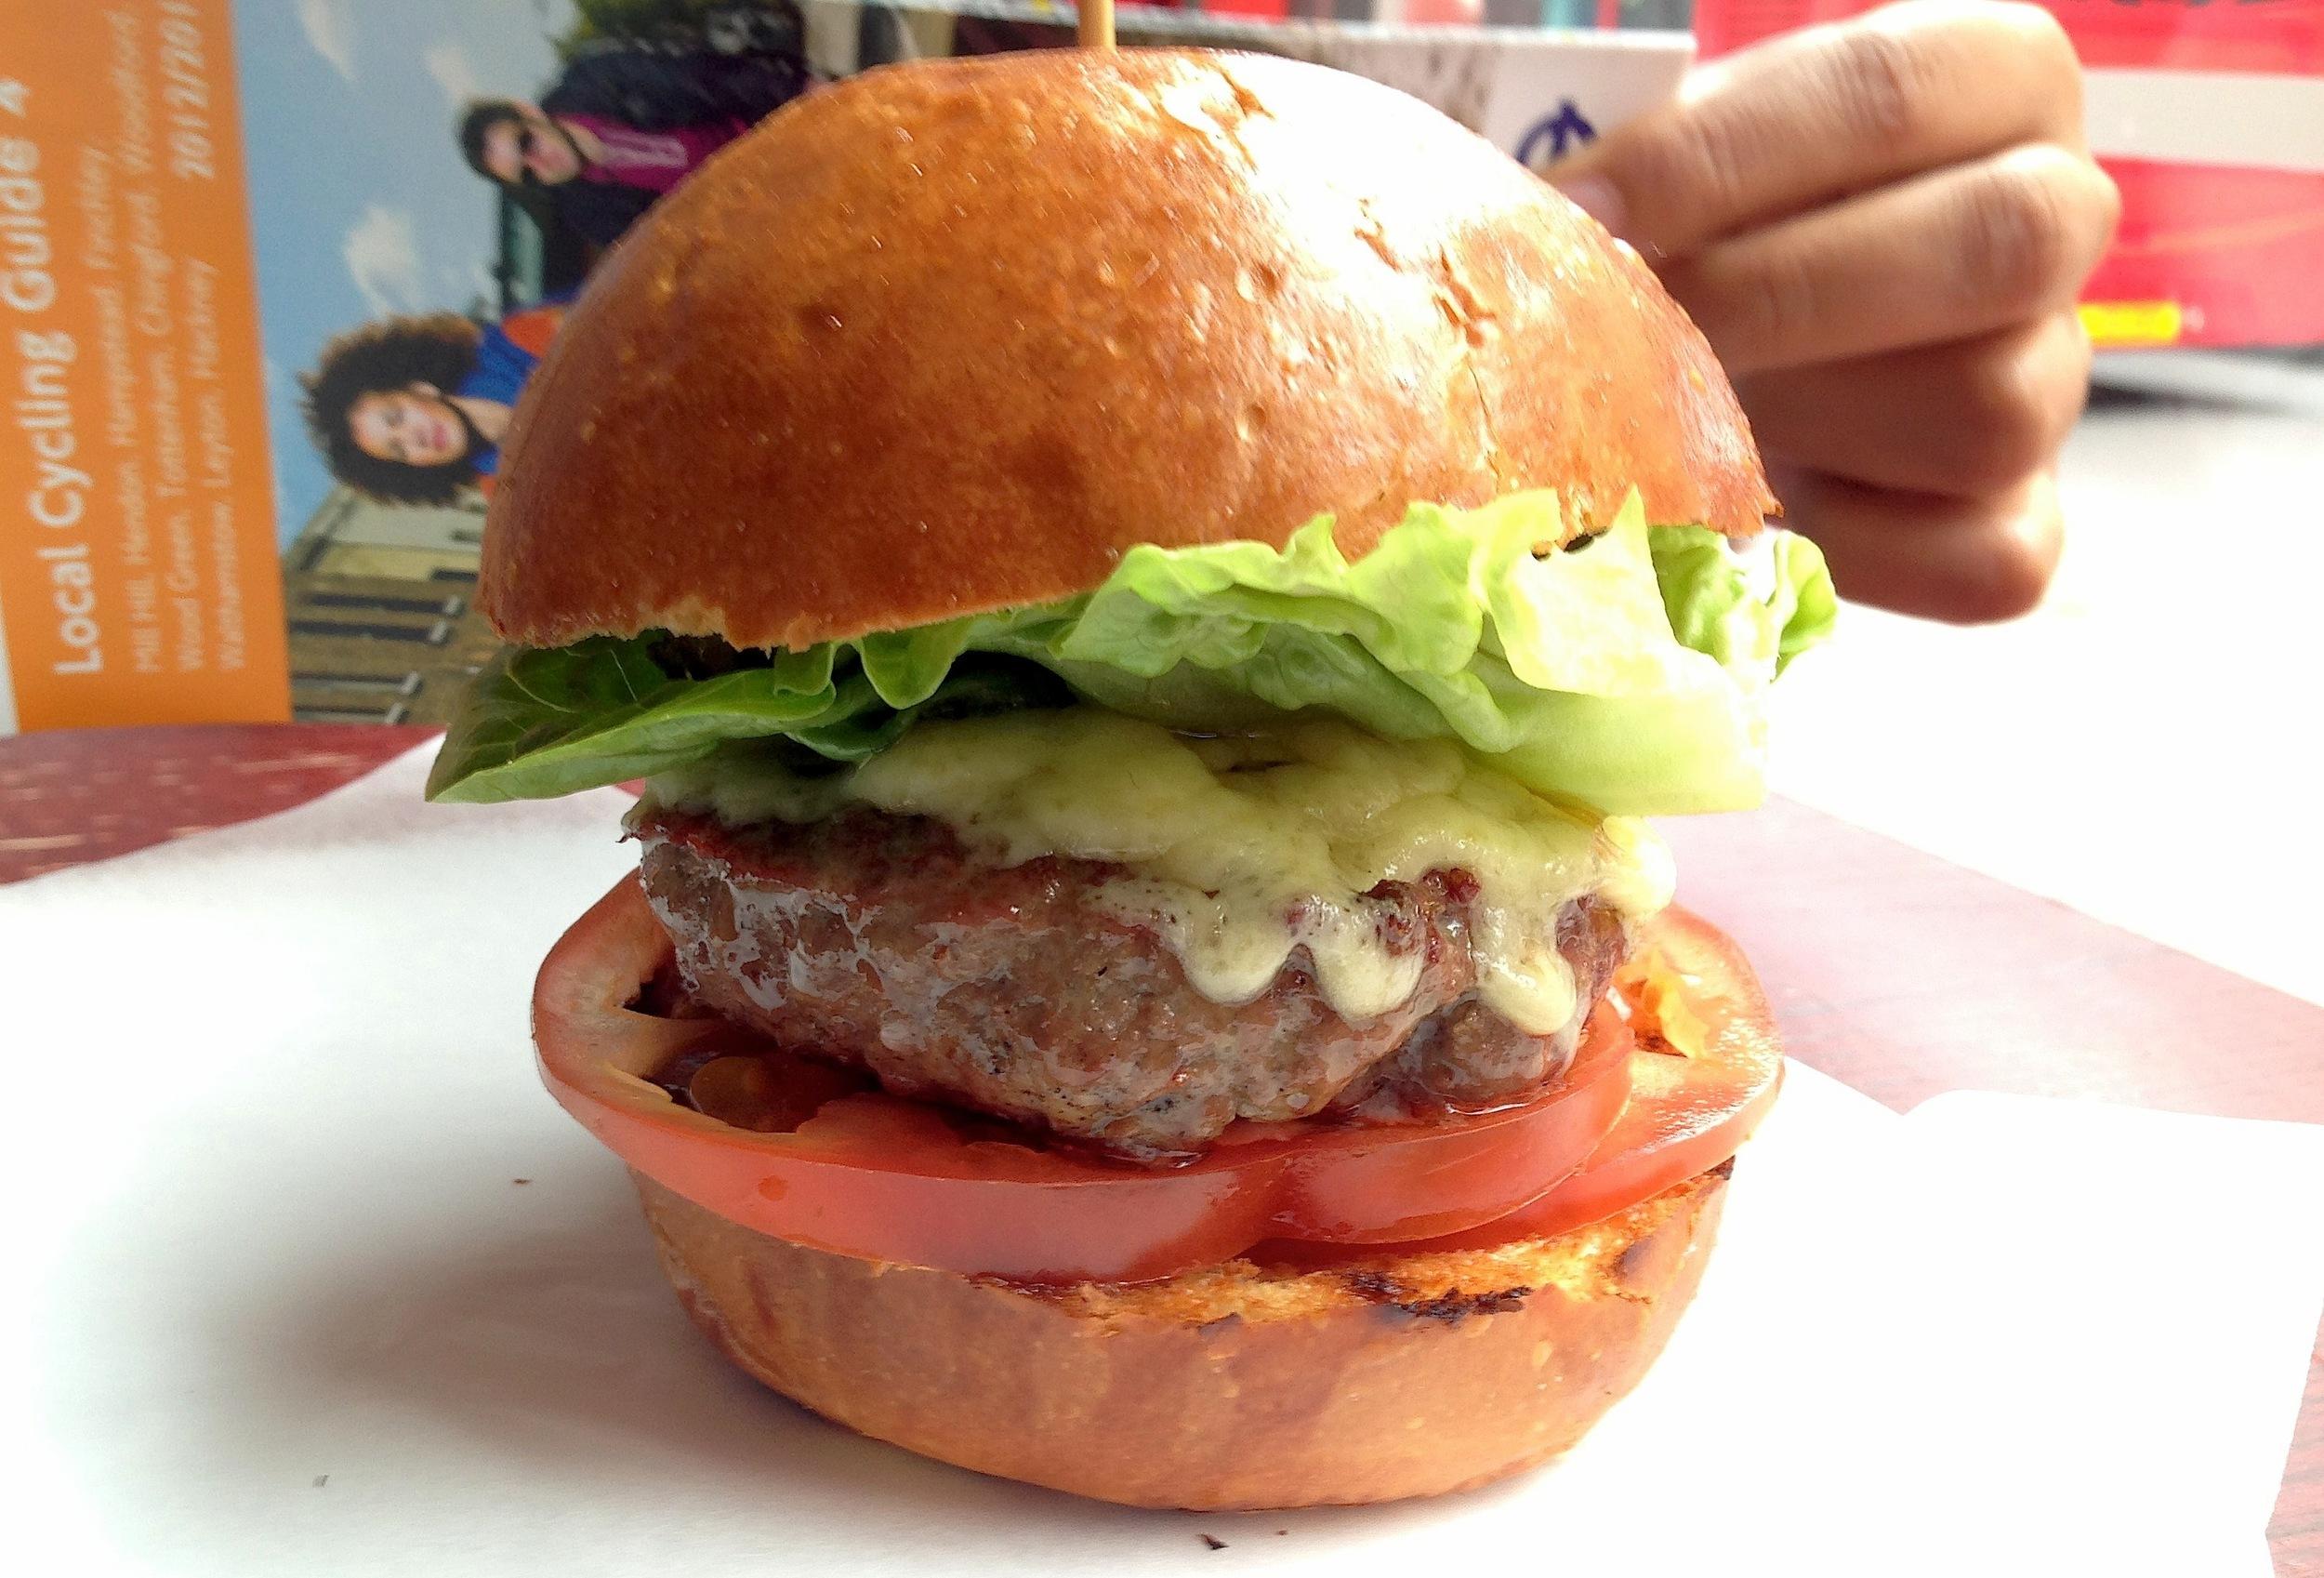 The cheeseburger at the Advisory, Hackney